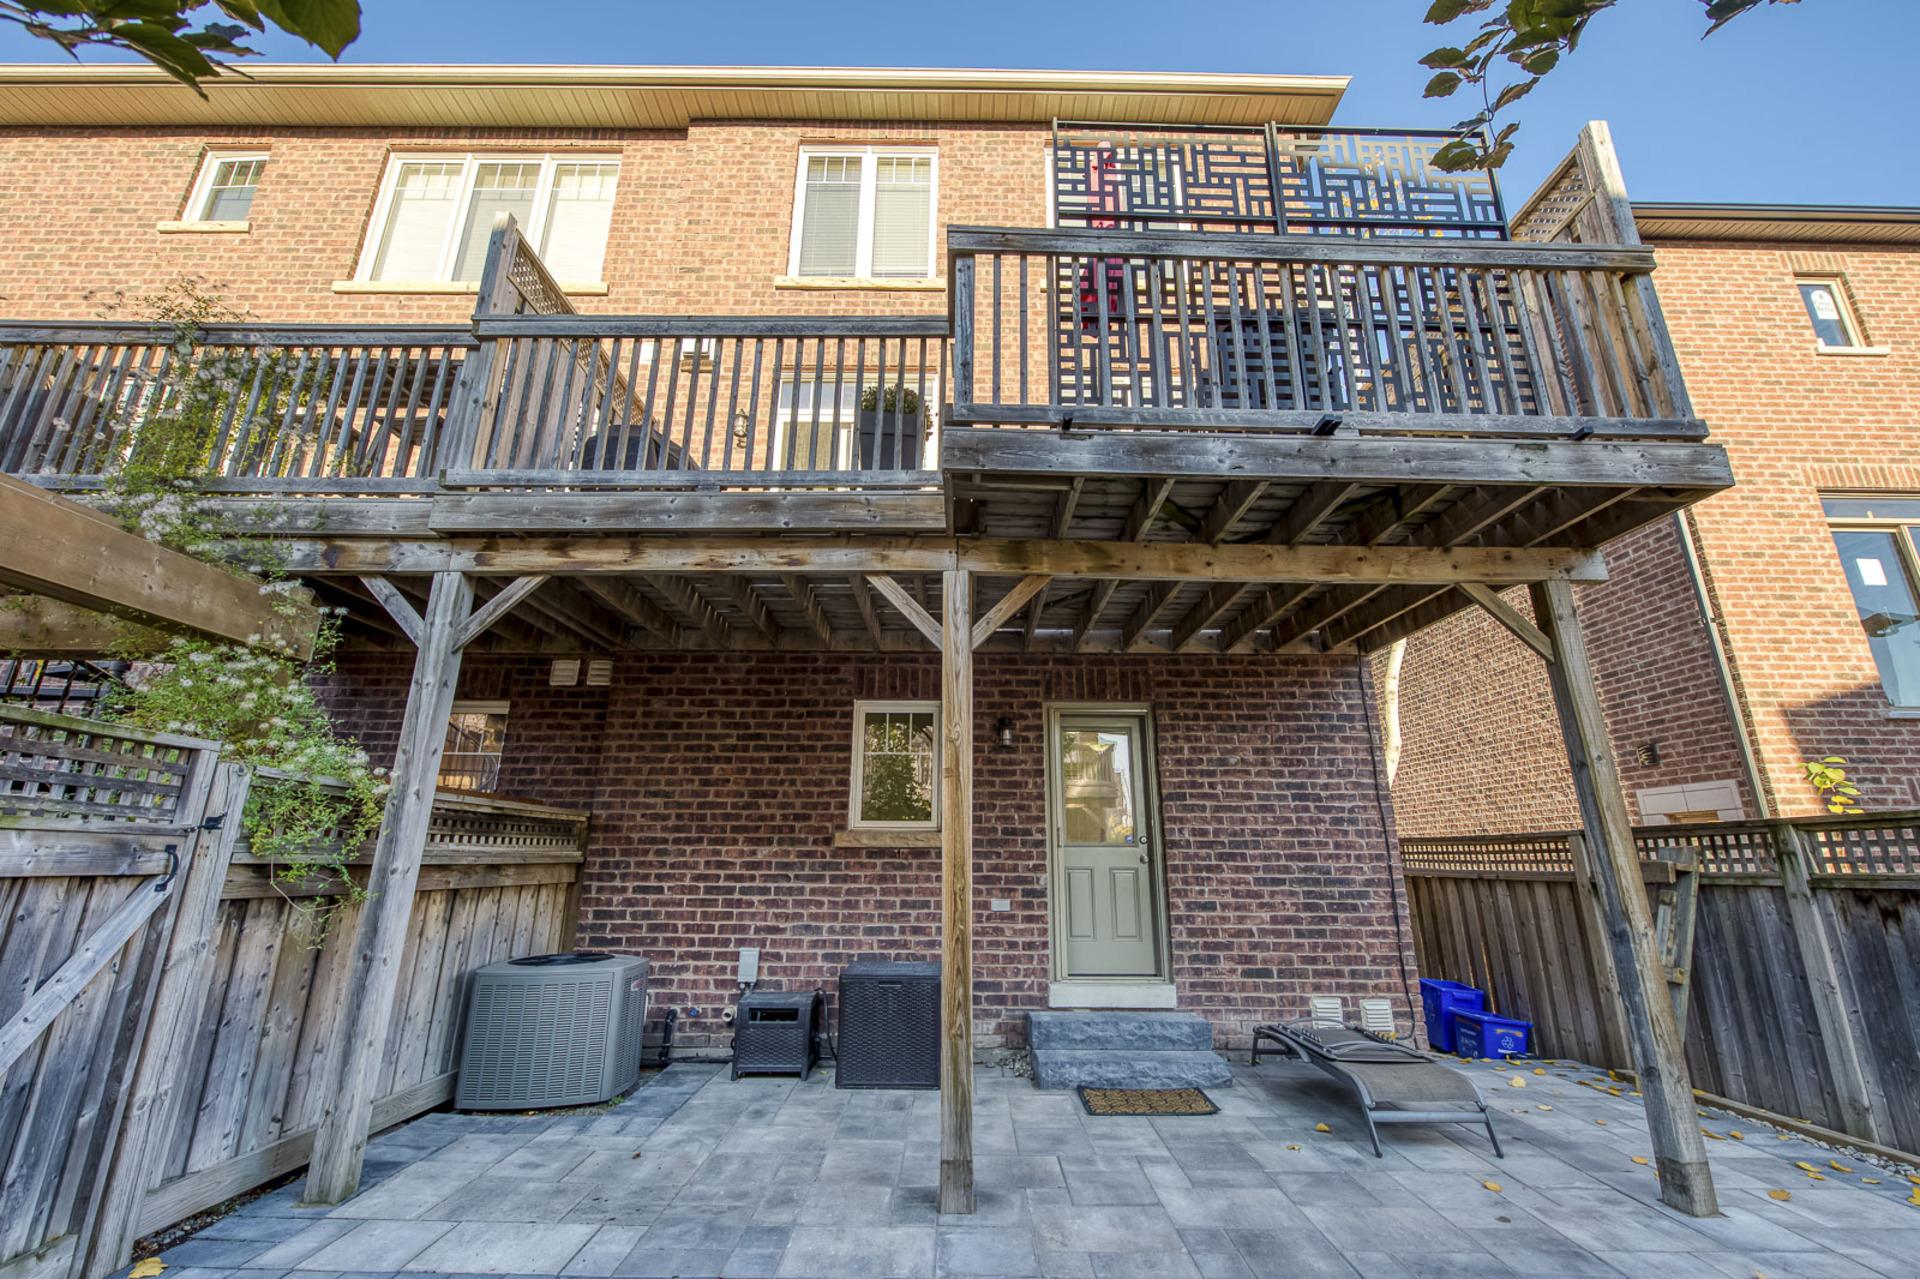 Backyard - 2014 Lushes Ave, Mississauga - Elite3 & Team at 2014 Lushes Avenue, Clarkson, Mississauga